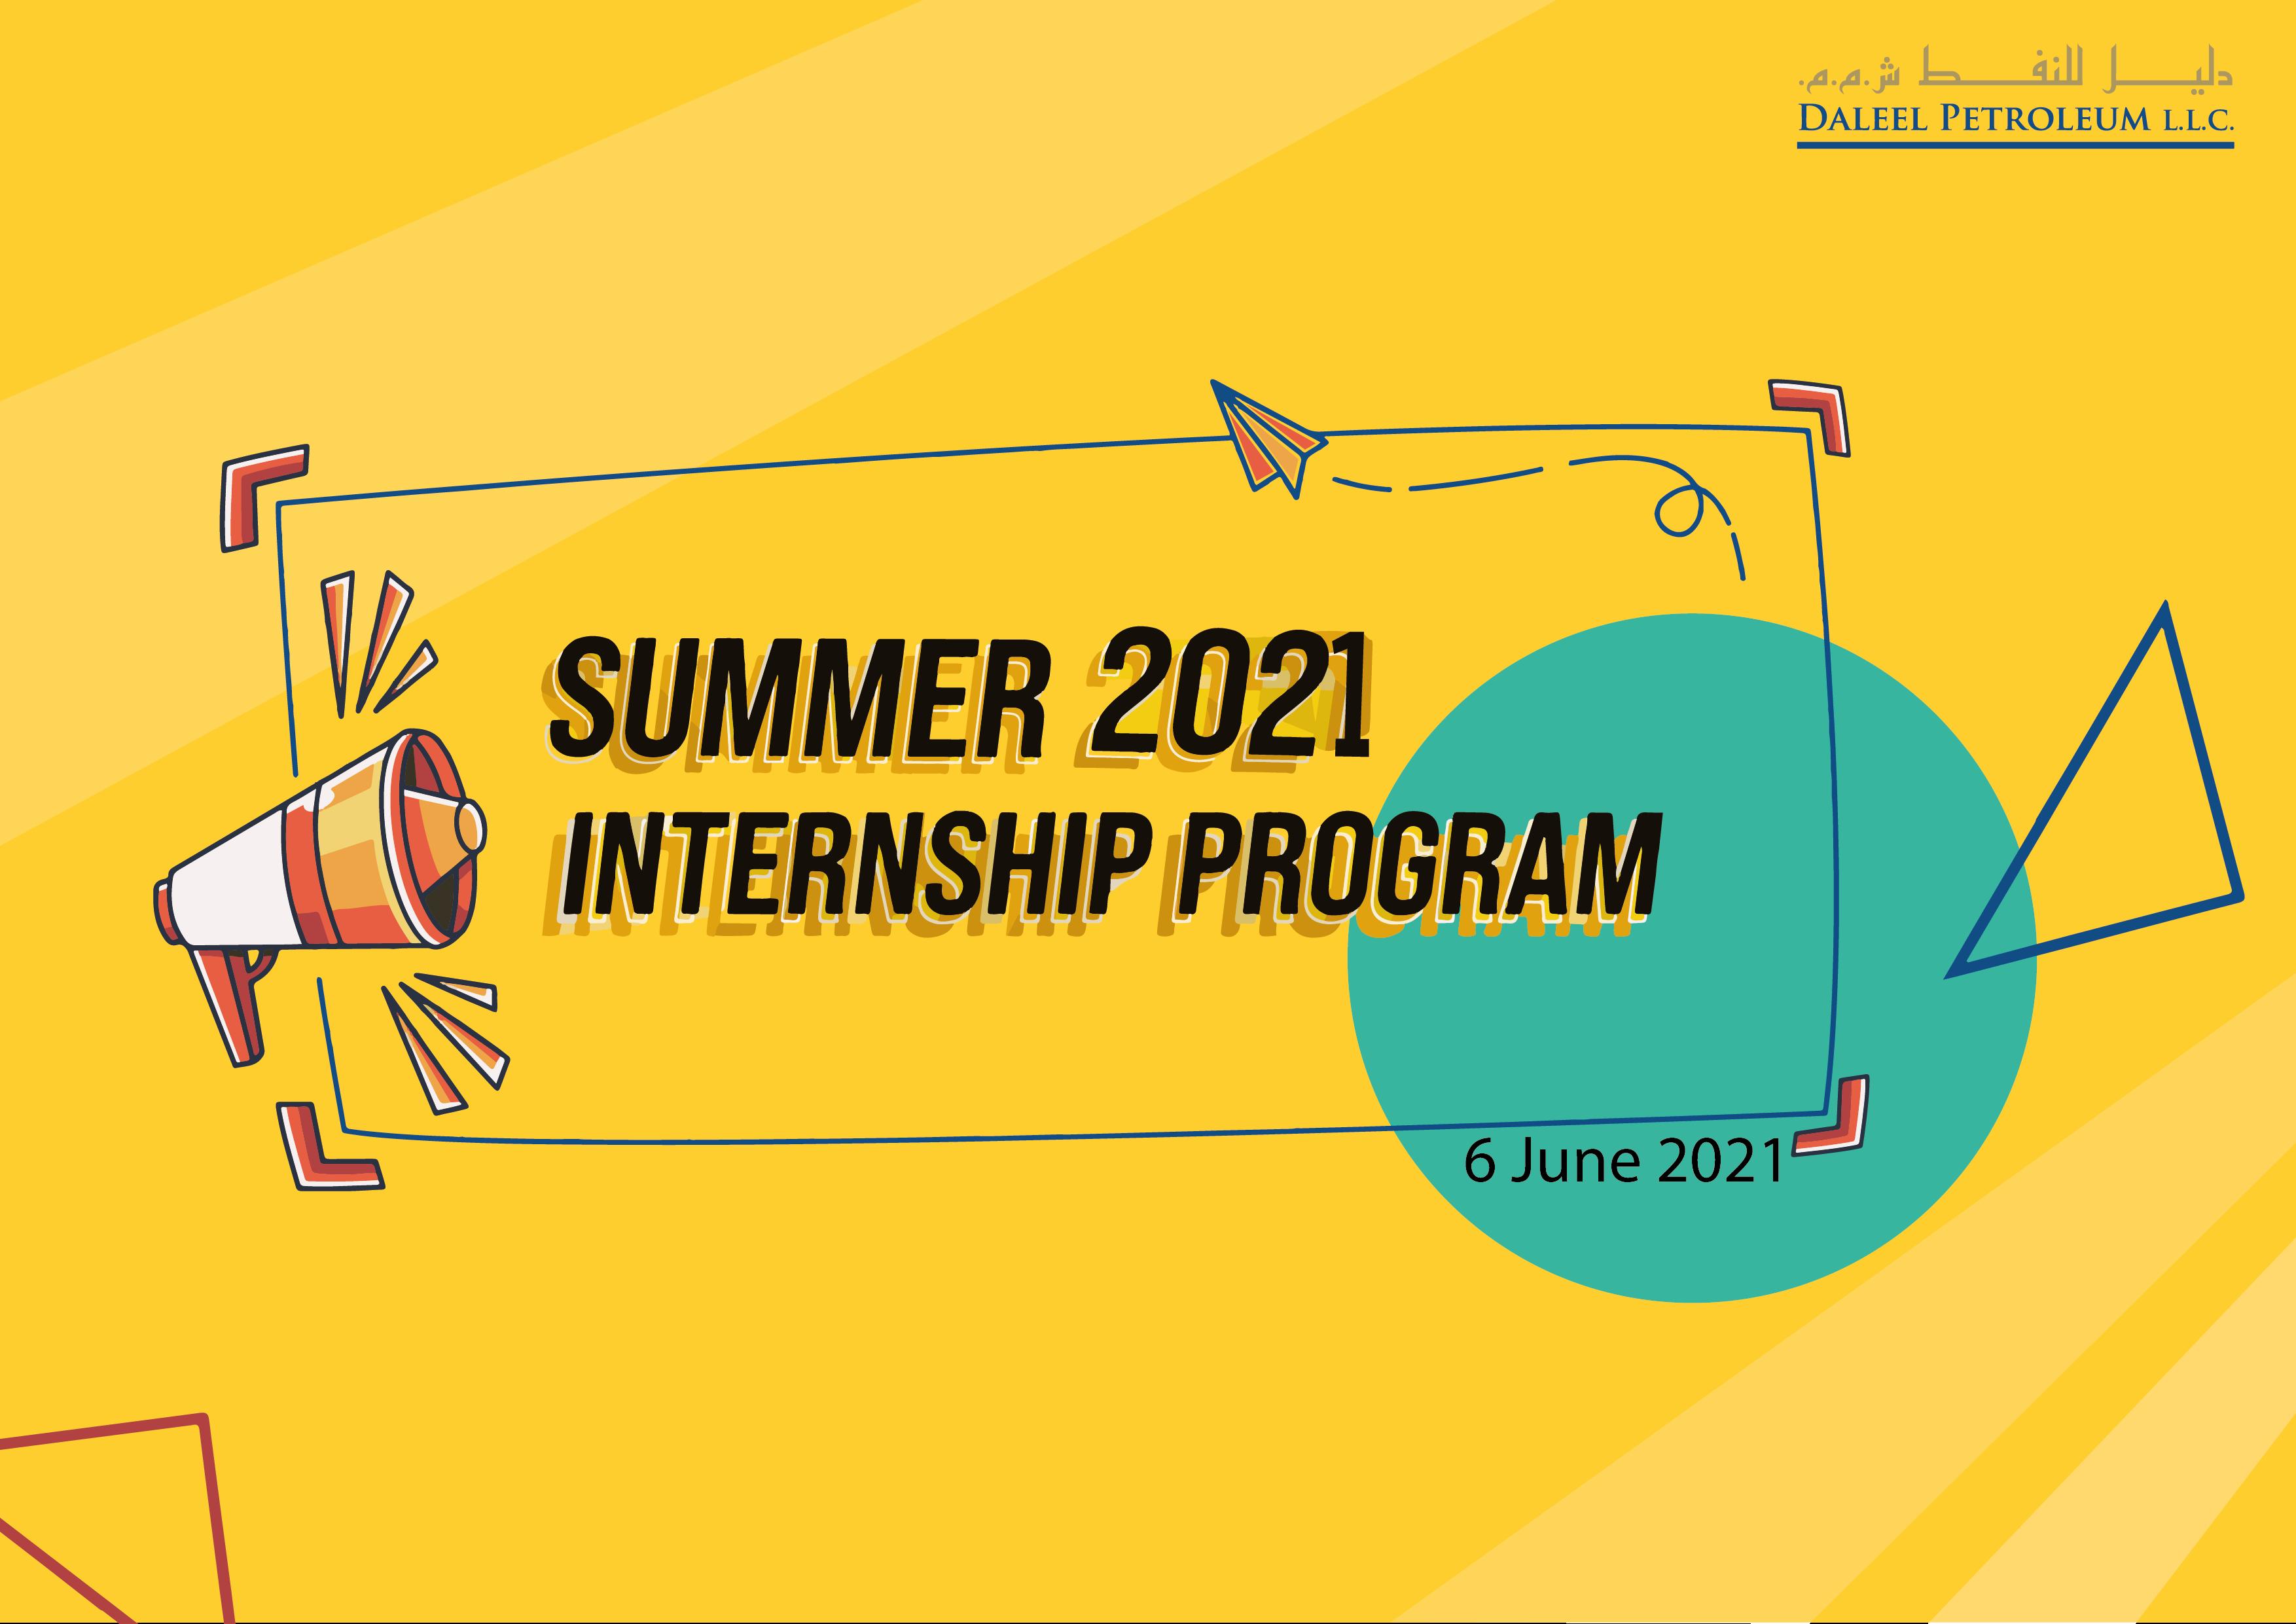 Virtually: Daleel Petroleum Welcomes 74 Students for Summer Internship Program